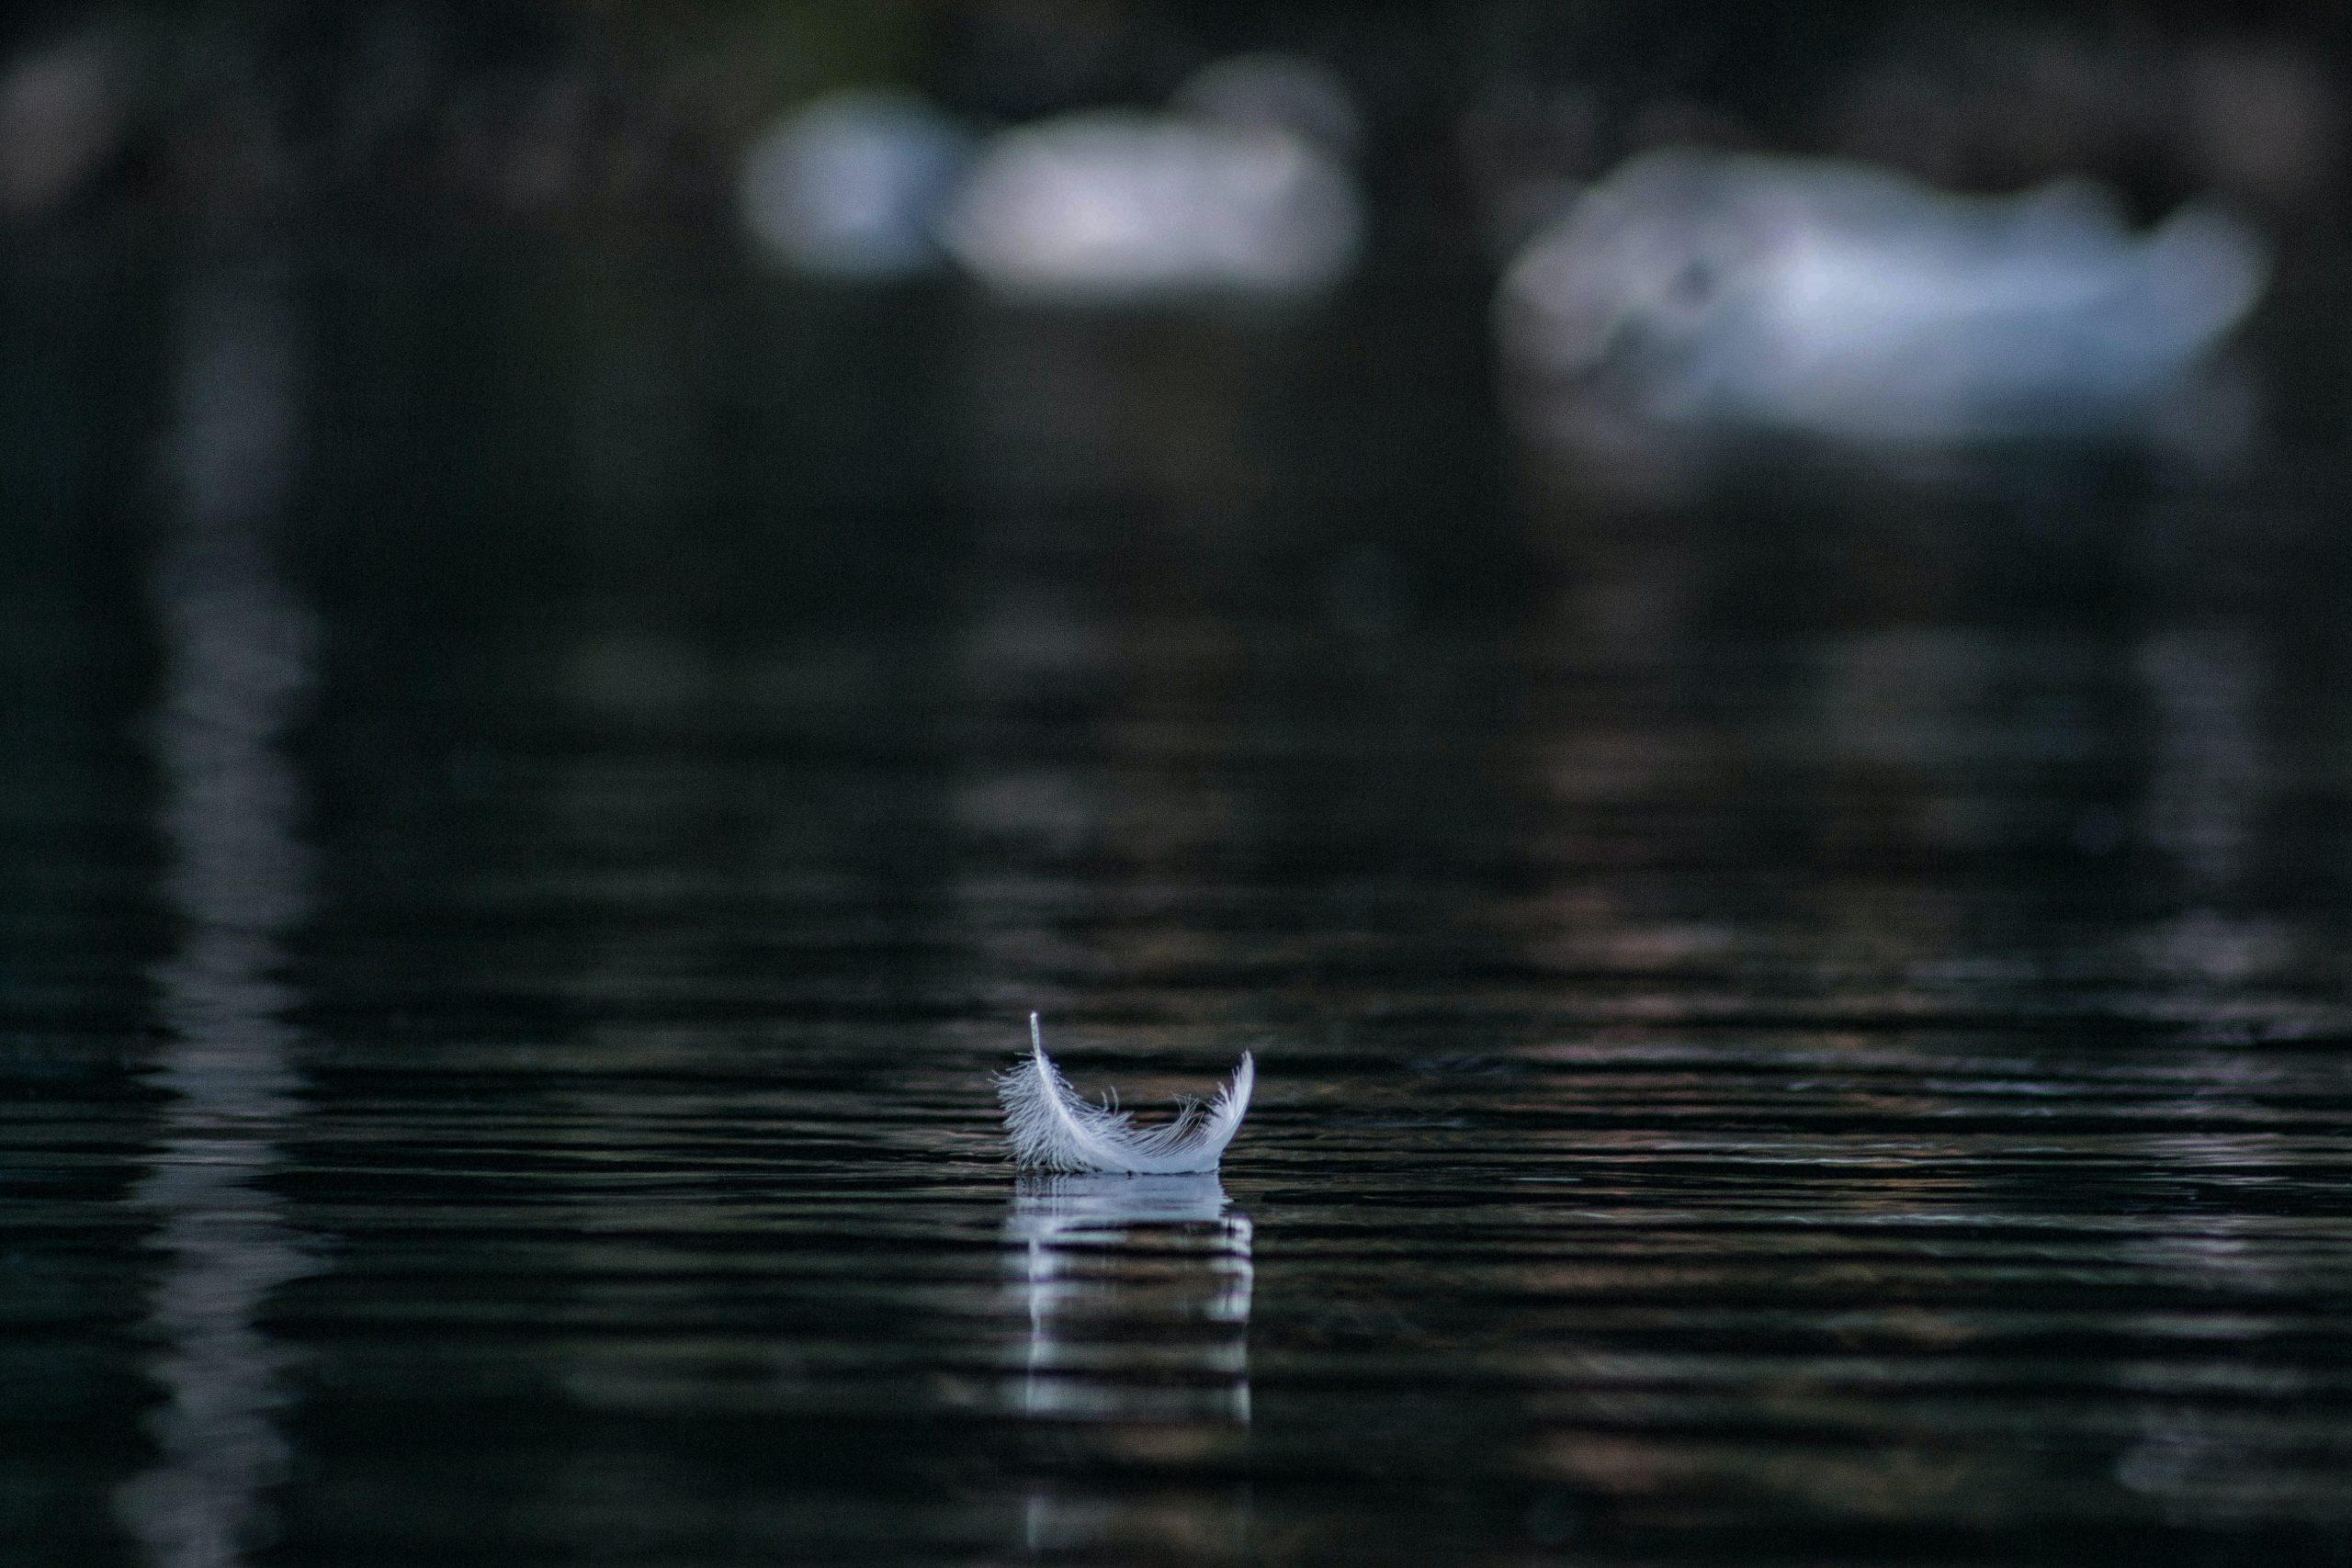 Valkoinen höyhen kelluu veden pinnalla.